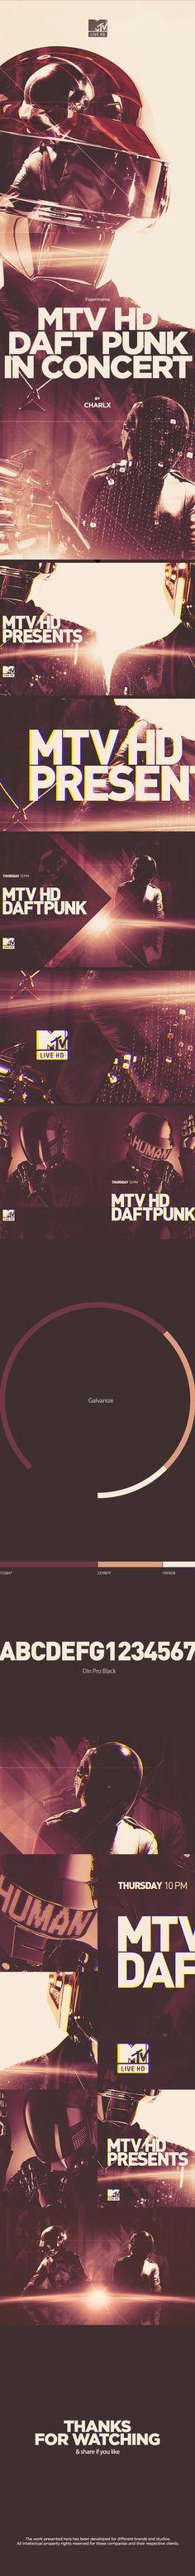 motion graphics/ storyboards/ styleframes | MTV HD | DAFT PUNK